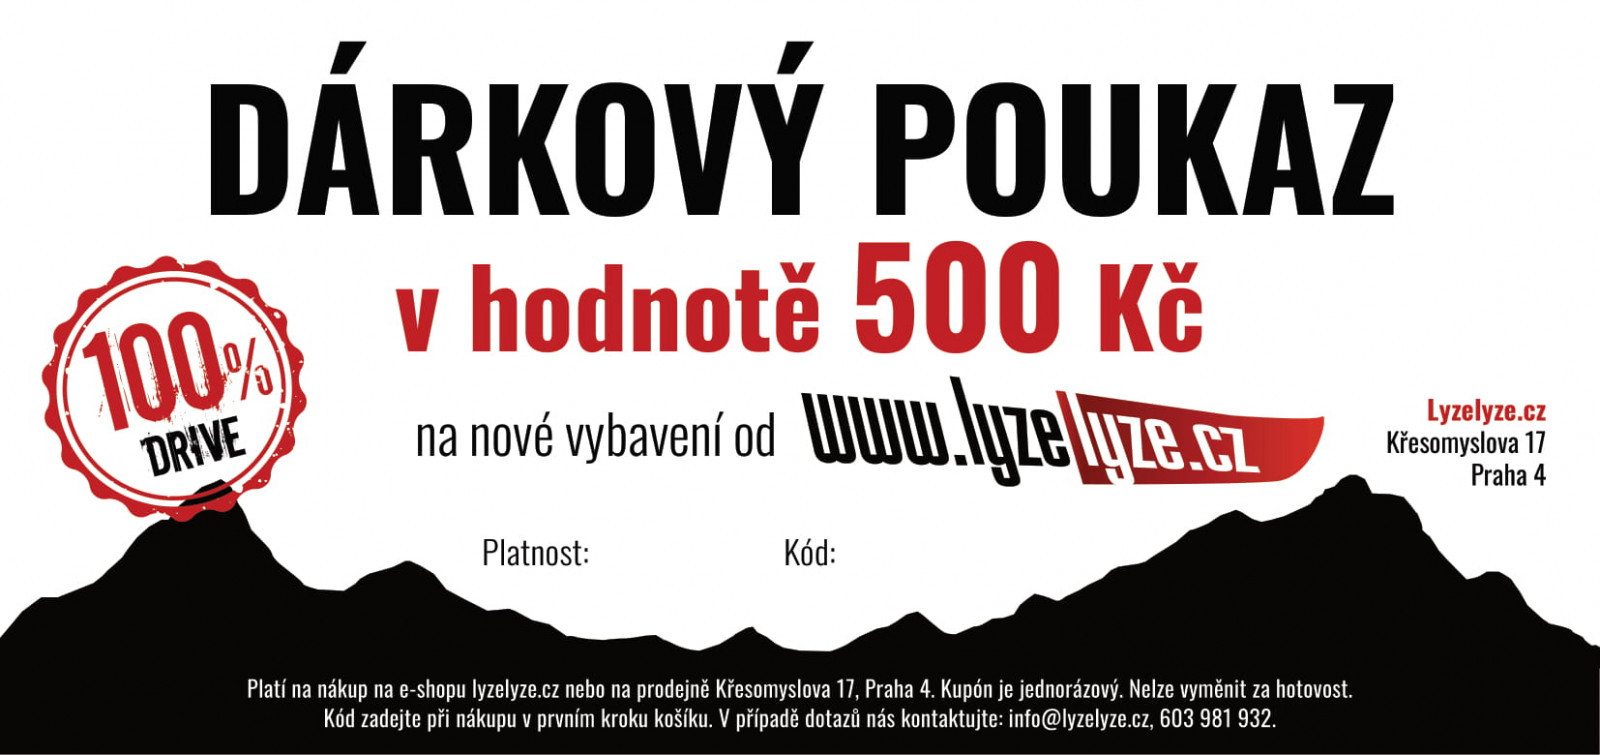 LyzeLyze.cz Darčekový poukaz 500 Sk